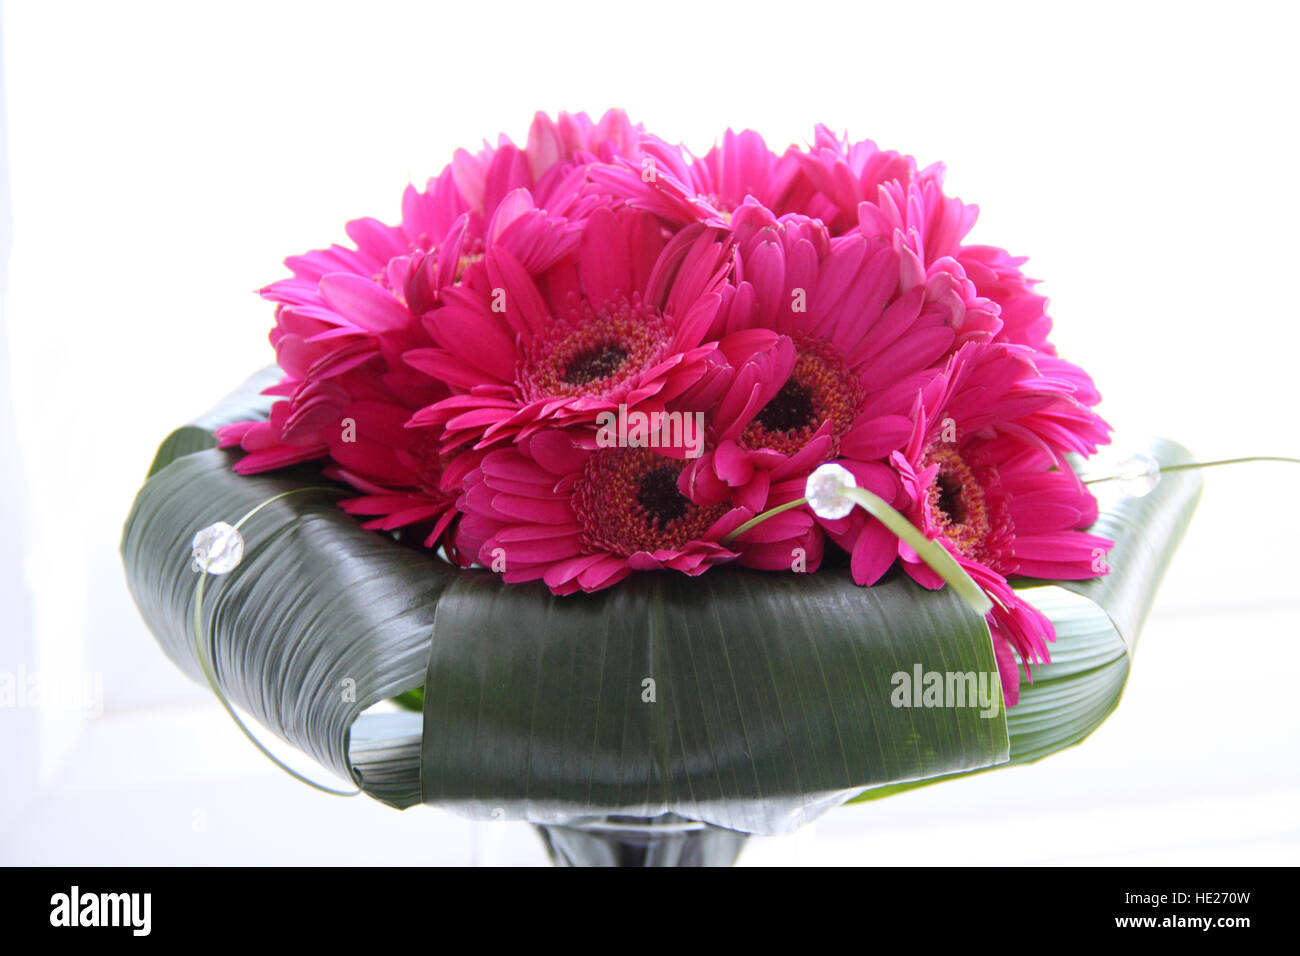 Wedding bouquet of gerberas, or transvaal daisies. - Stock Image